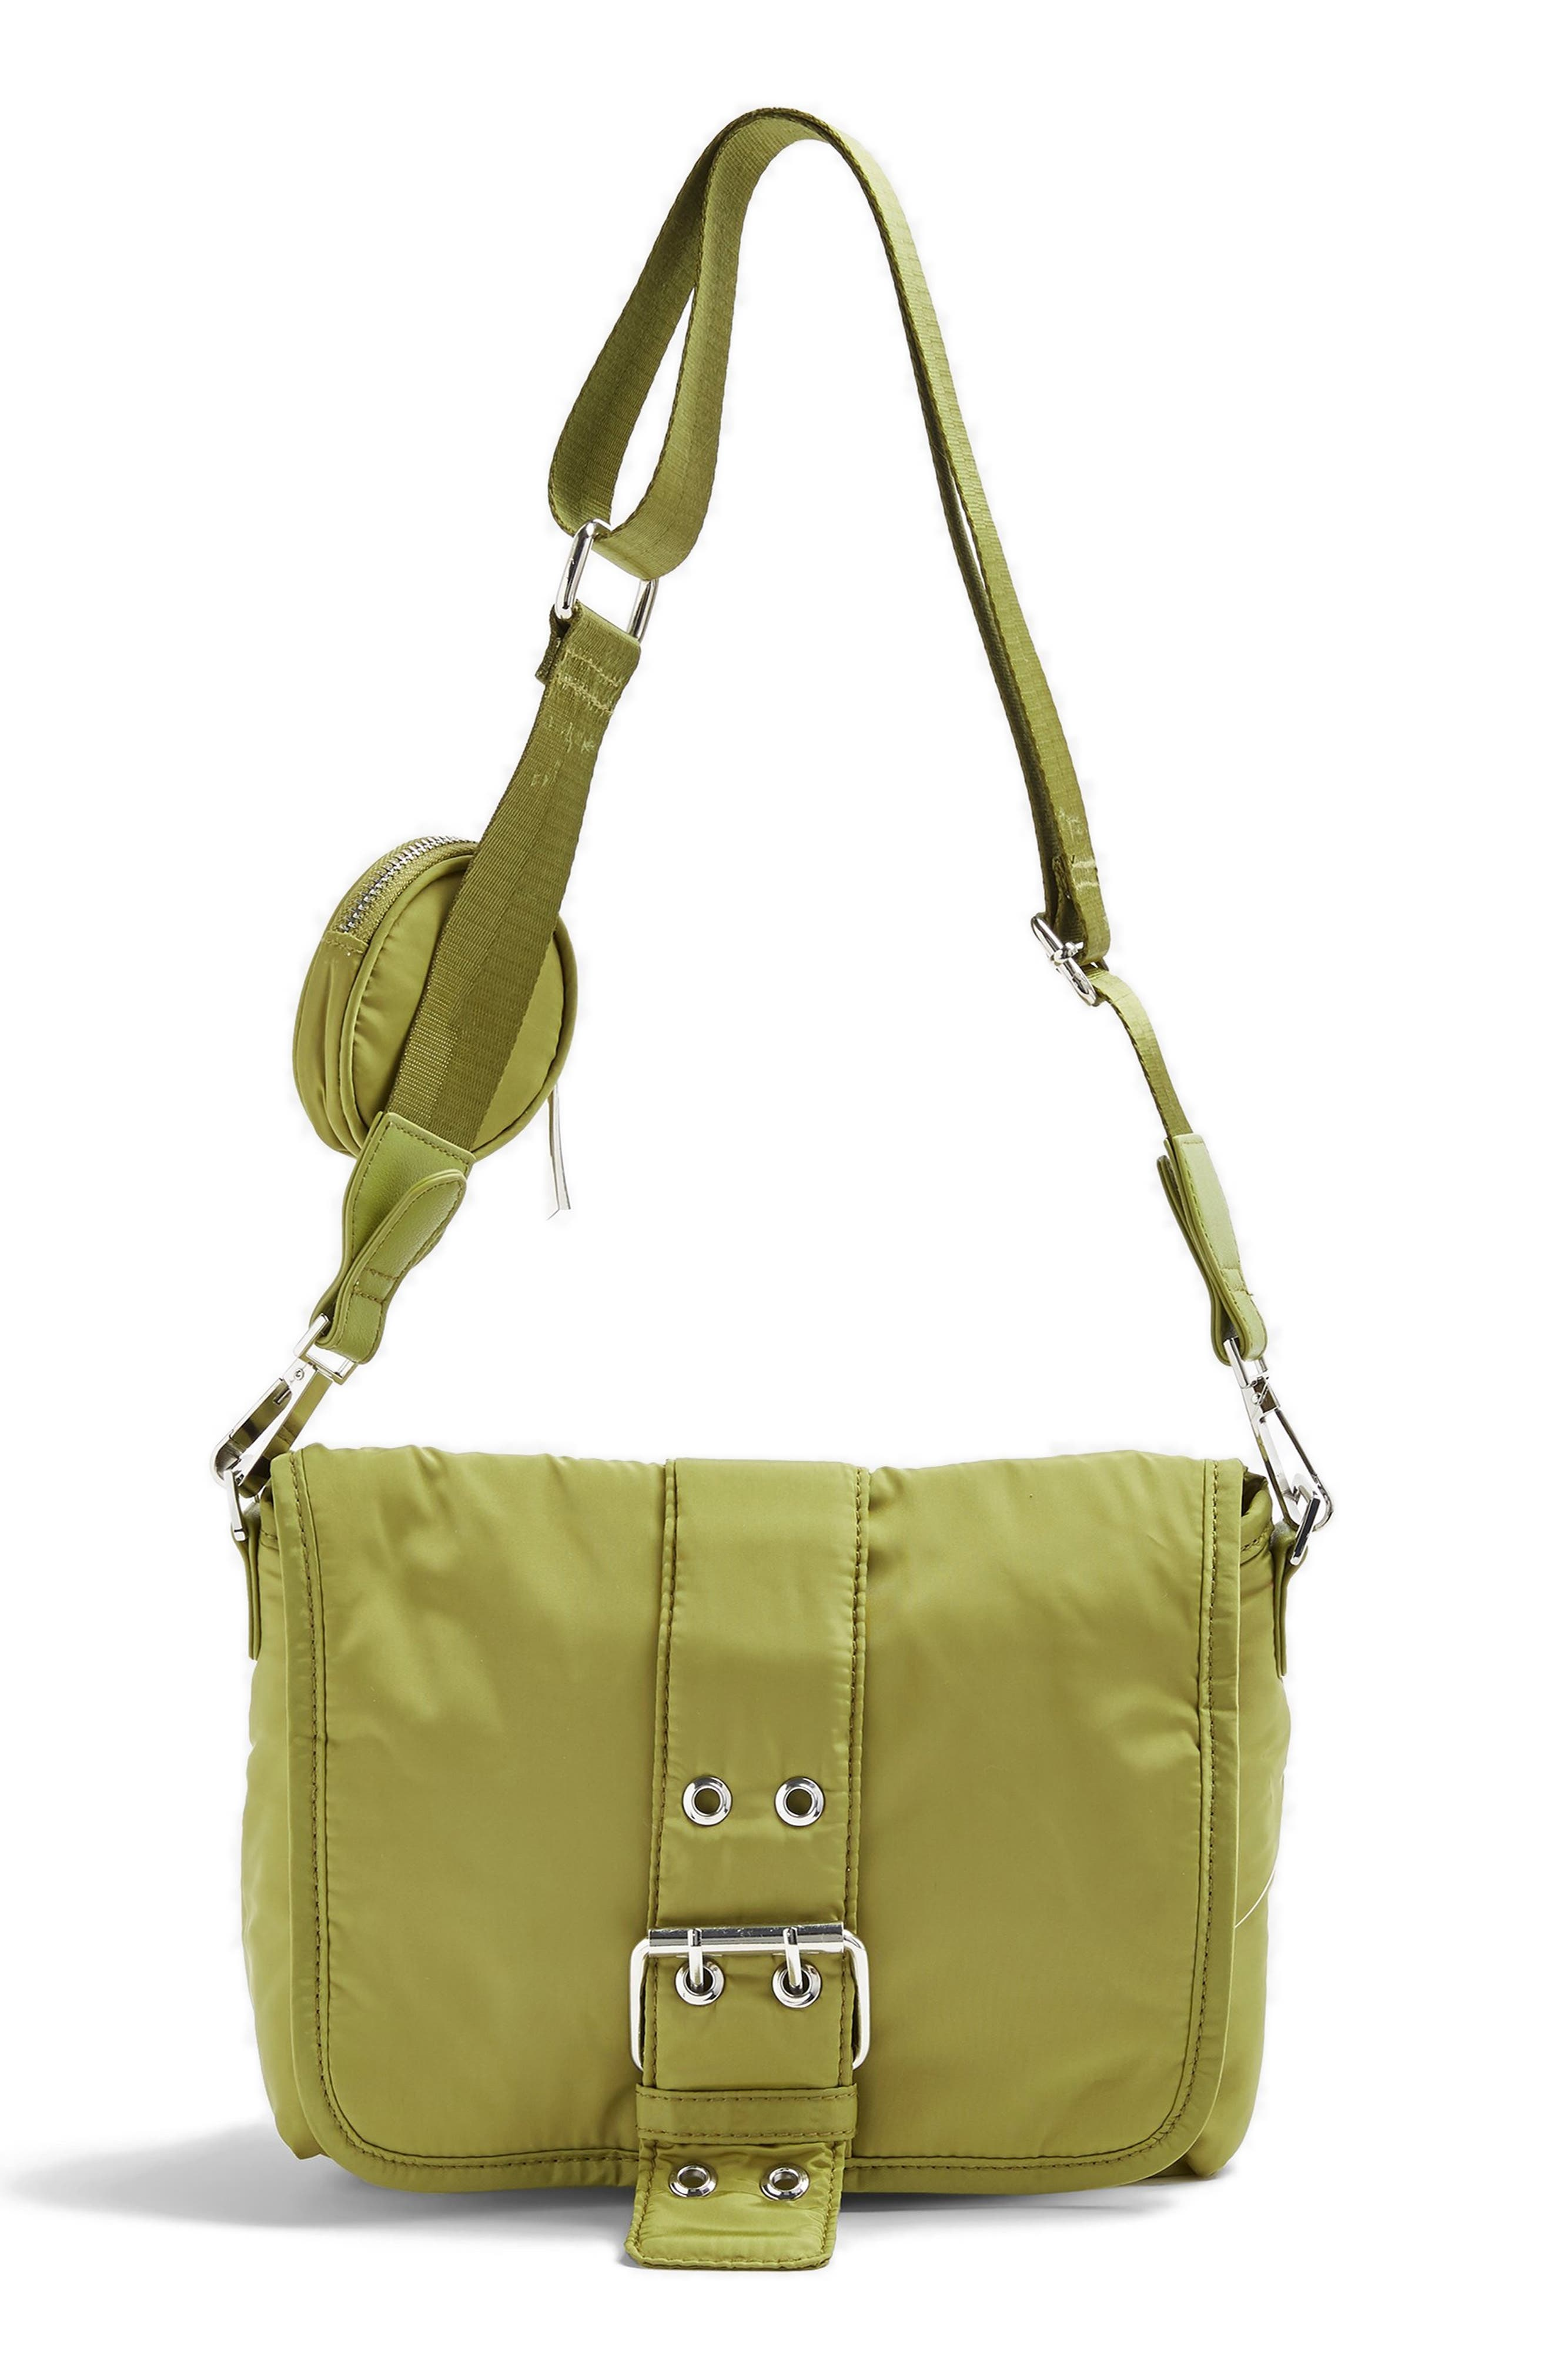 Image of TOPSHOP Buckled Crossbody Bag